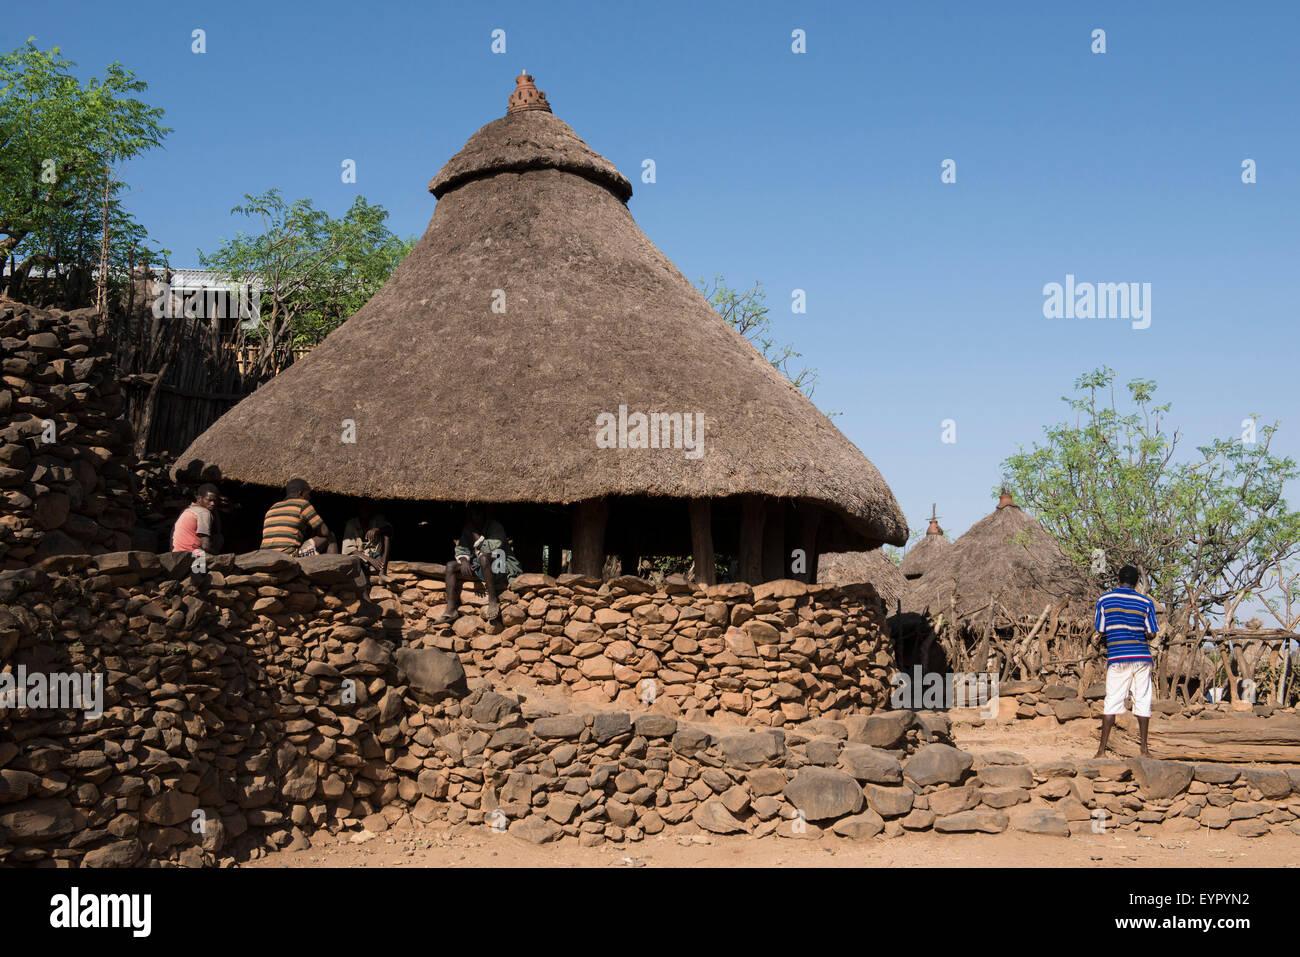 Communal house or mora in a Konso village, Konso Region, Ethiopia - Stock Image